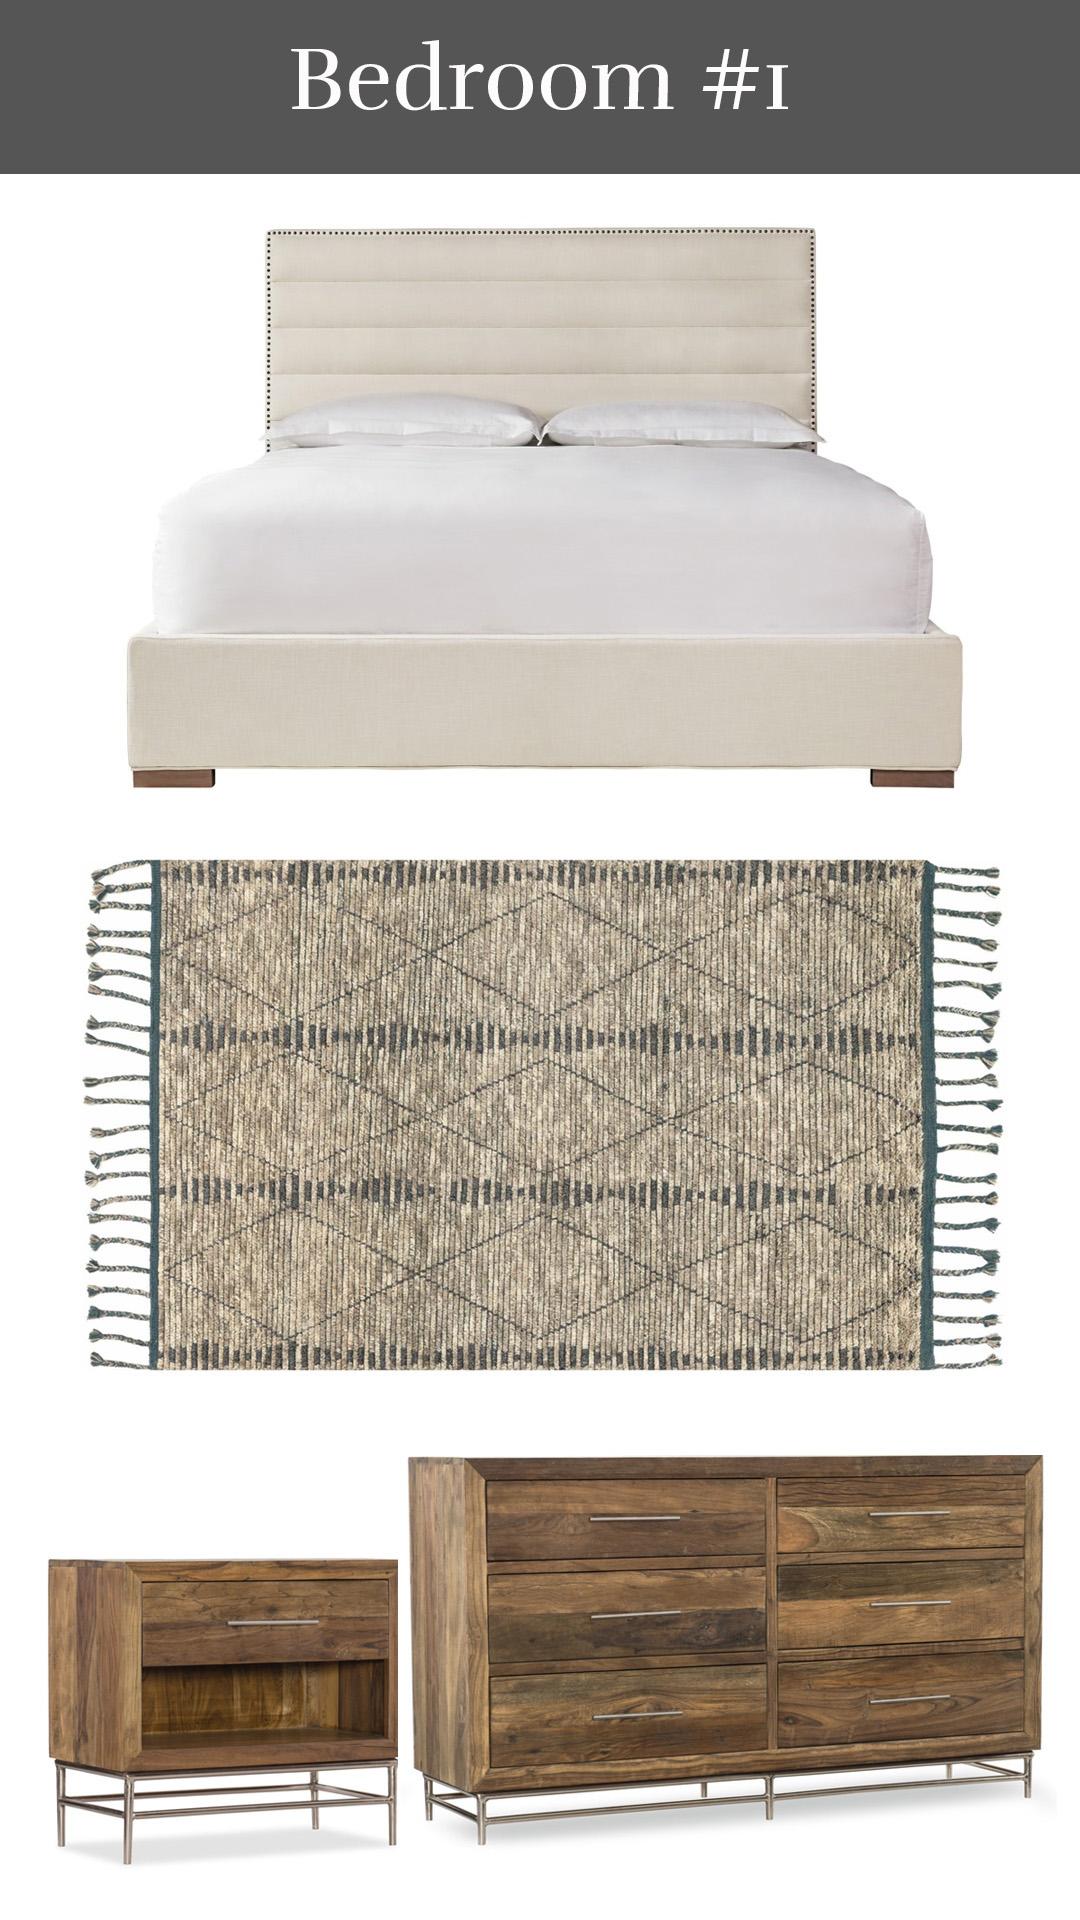 Bohemian Beauty - Synchronicity Upholstered Bed+ Tulum Rug + L'Usine Nightstand & Dresser